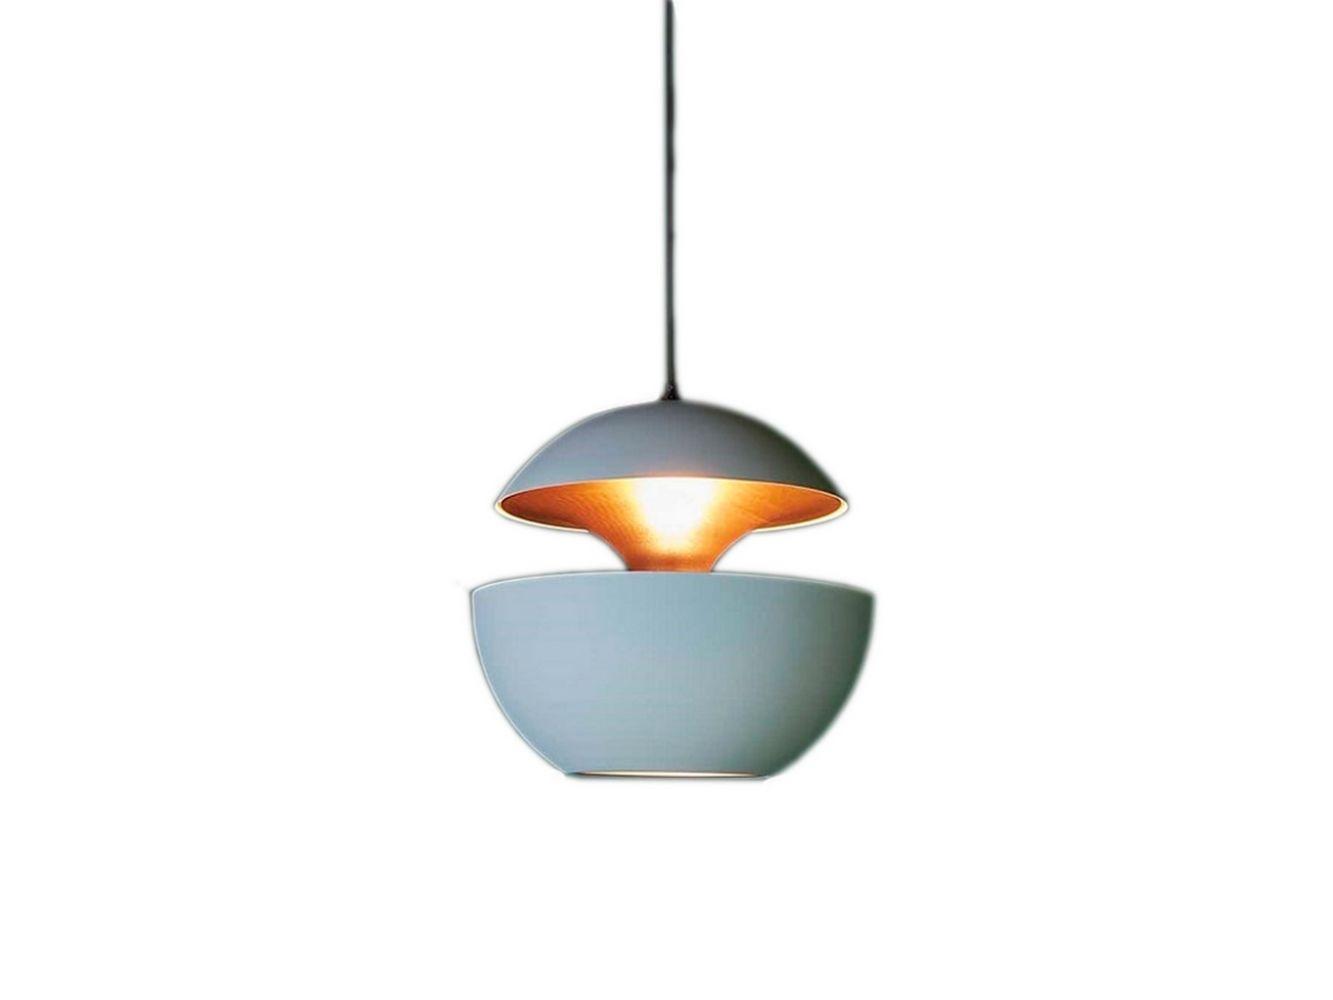 Ecolight Deco 003141